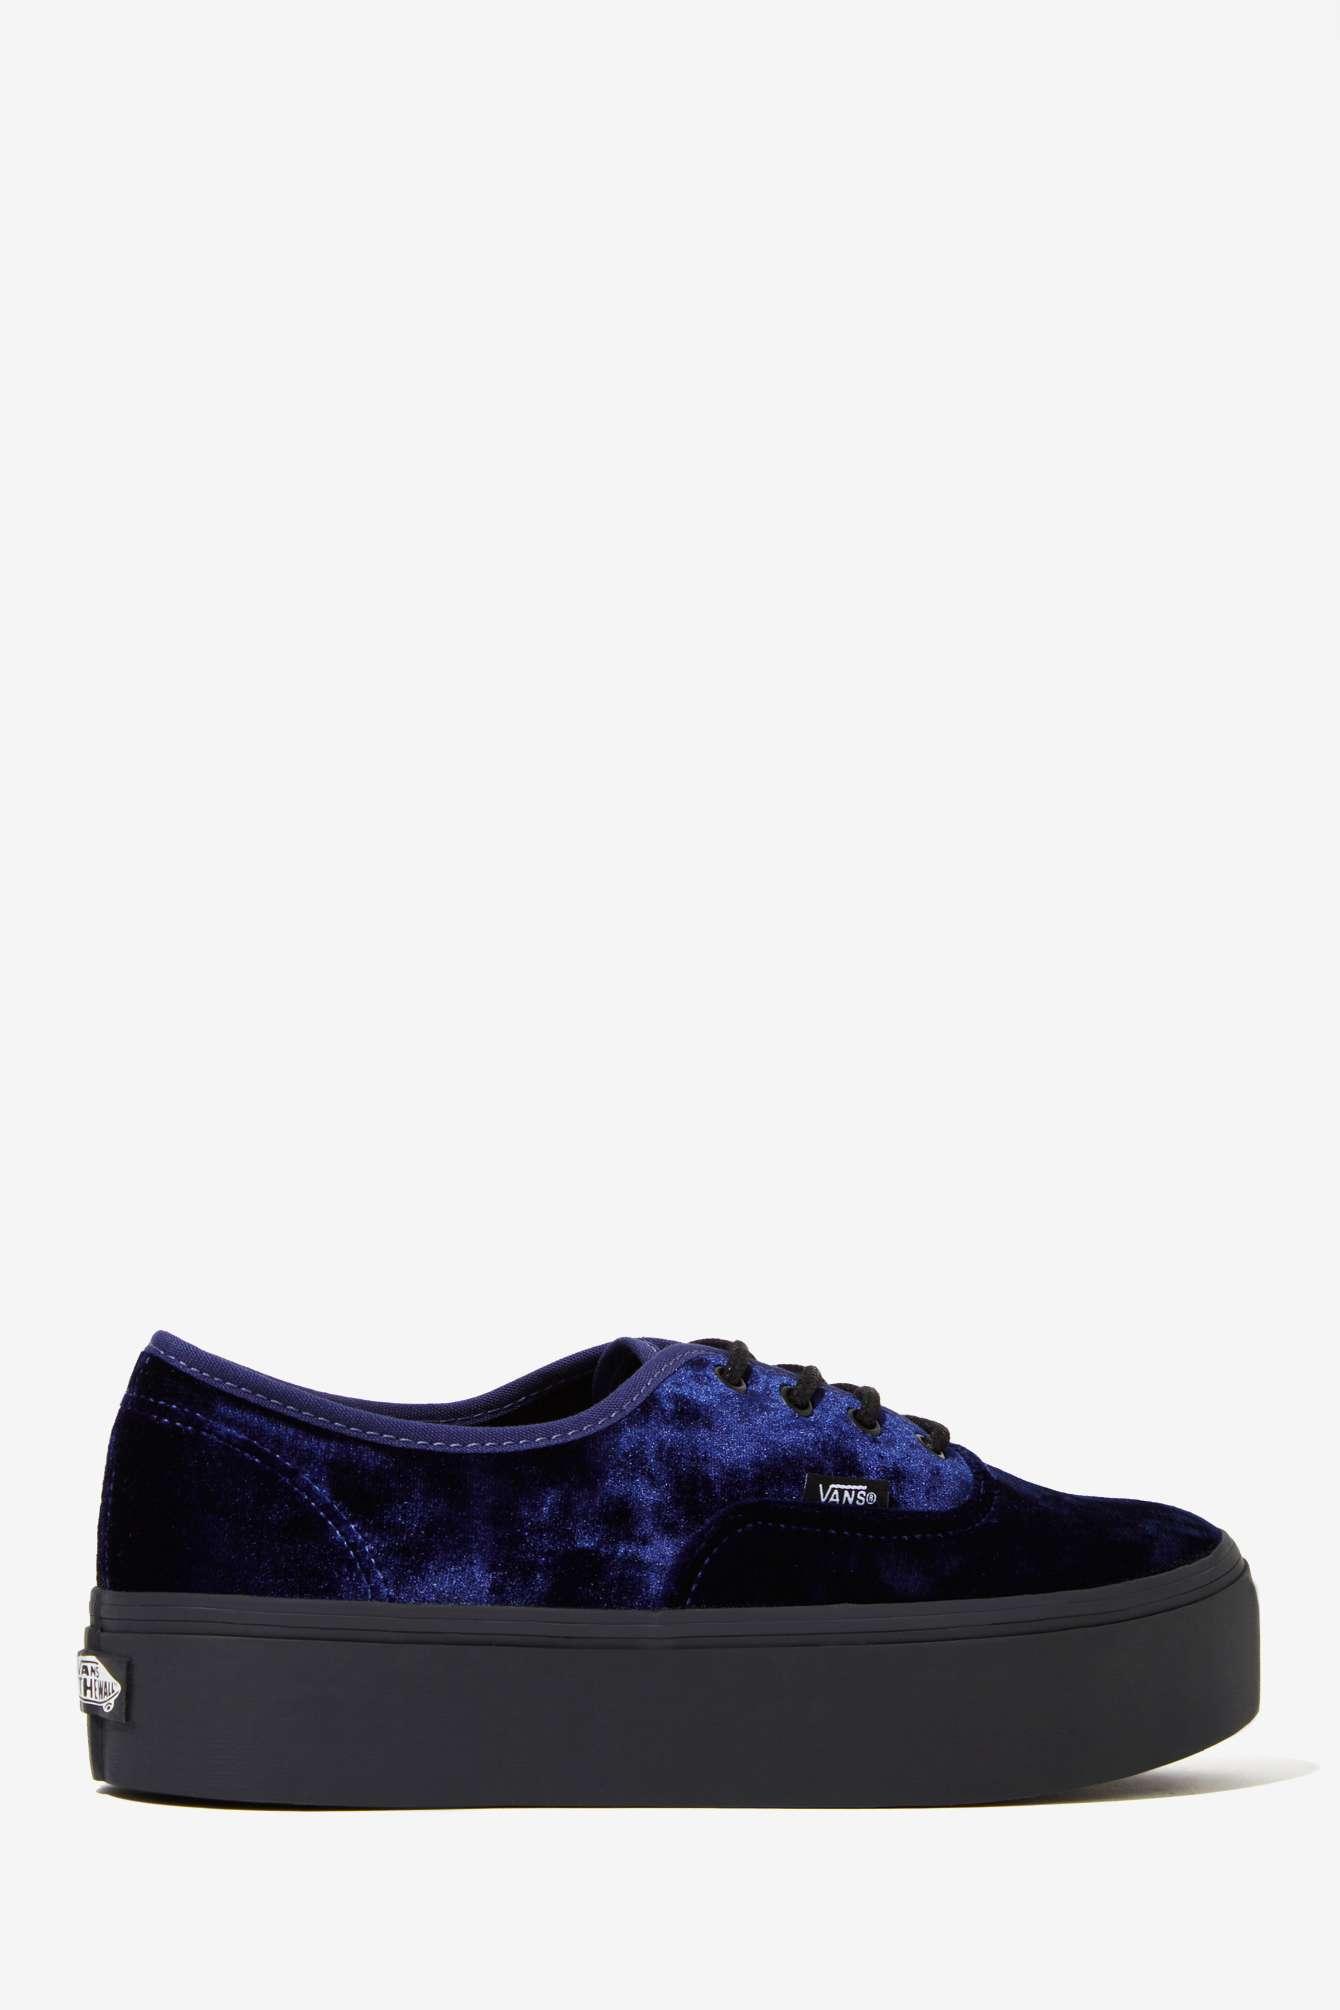 c6f98be65a Lyst - Nasty Gal Vans Authentic Platform Sneaker - Blue Velvet in Blue